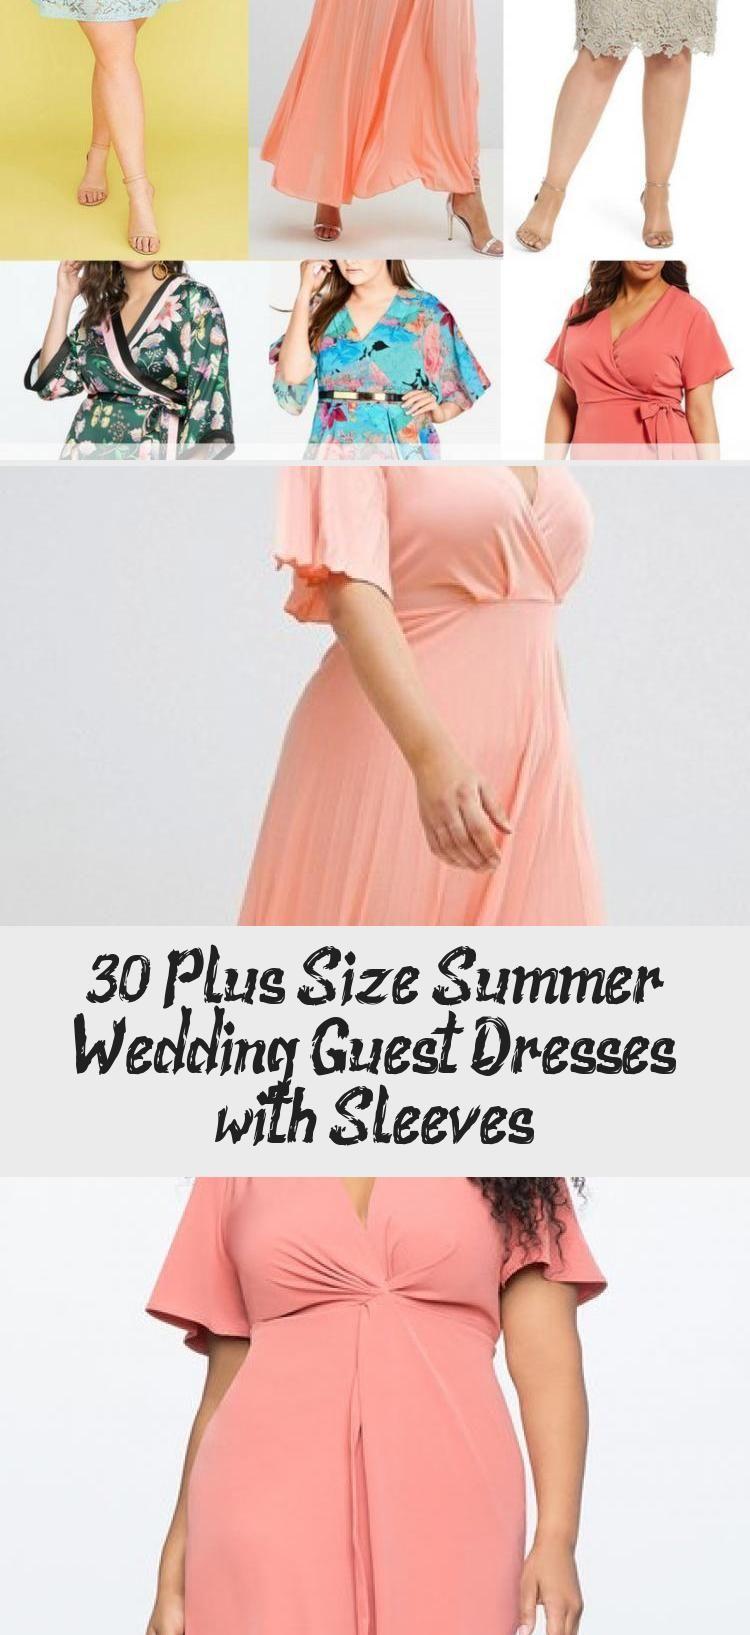 30 Plus Size Summer Wedding Guest Dresses With Sleeves Alexa Webb Weddingdressesgueststyleins In 2020 Wedding Guest Dress Summer Wedding Guest Dress Guest Dresses [ 1635 x 750 Pixel ]